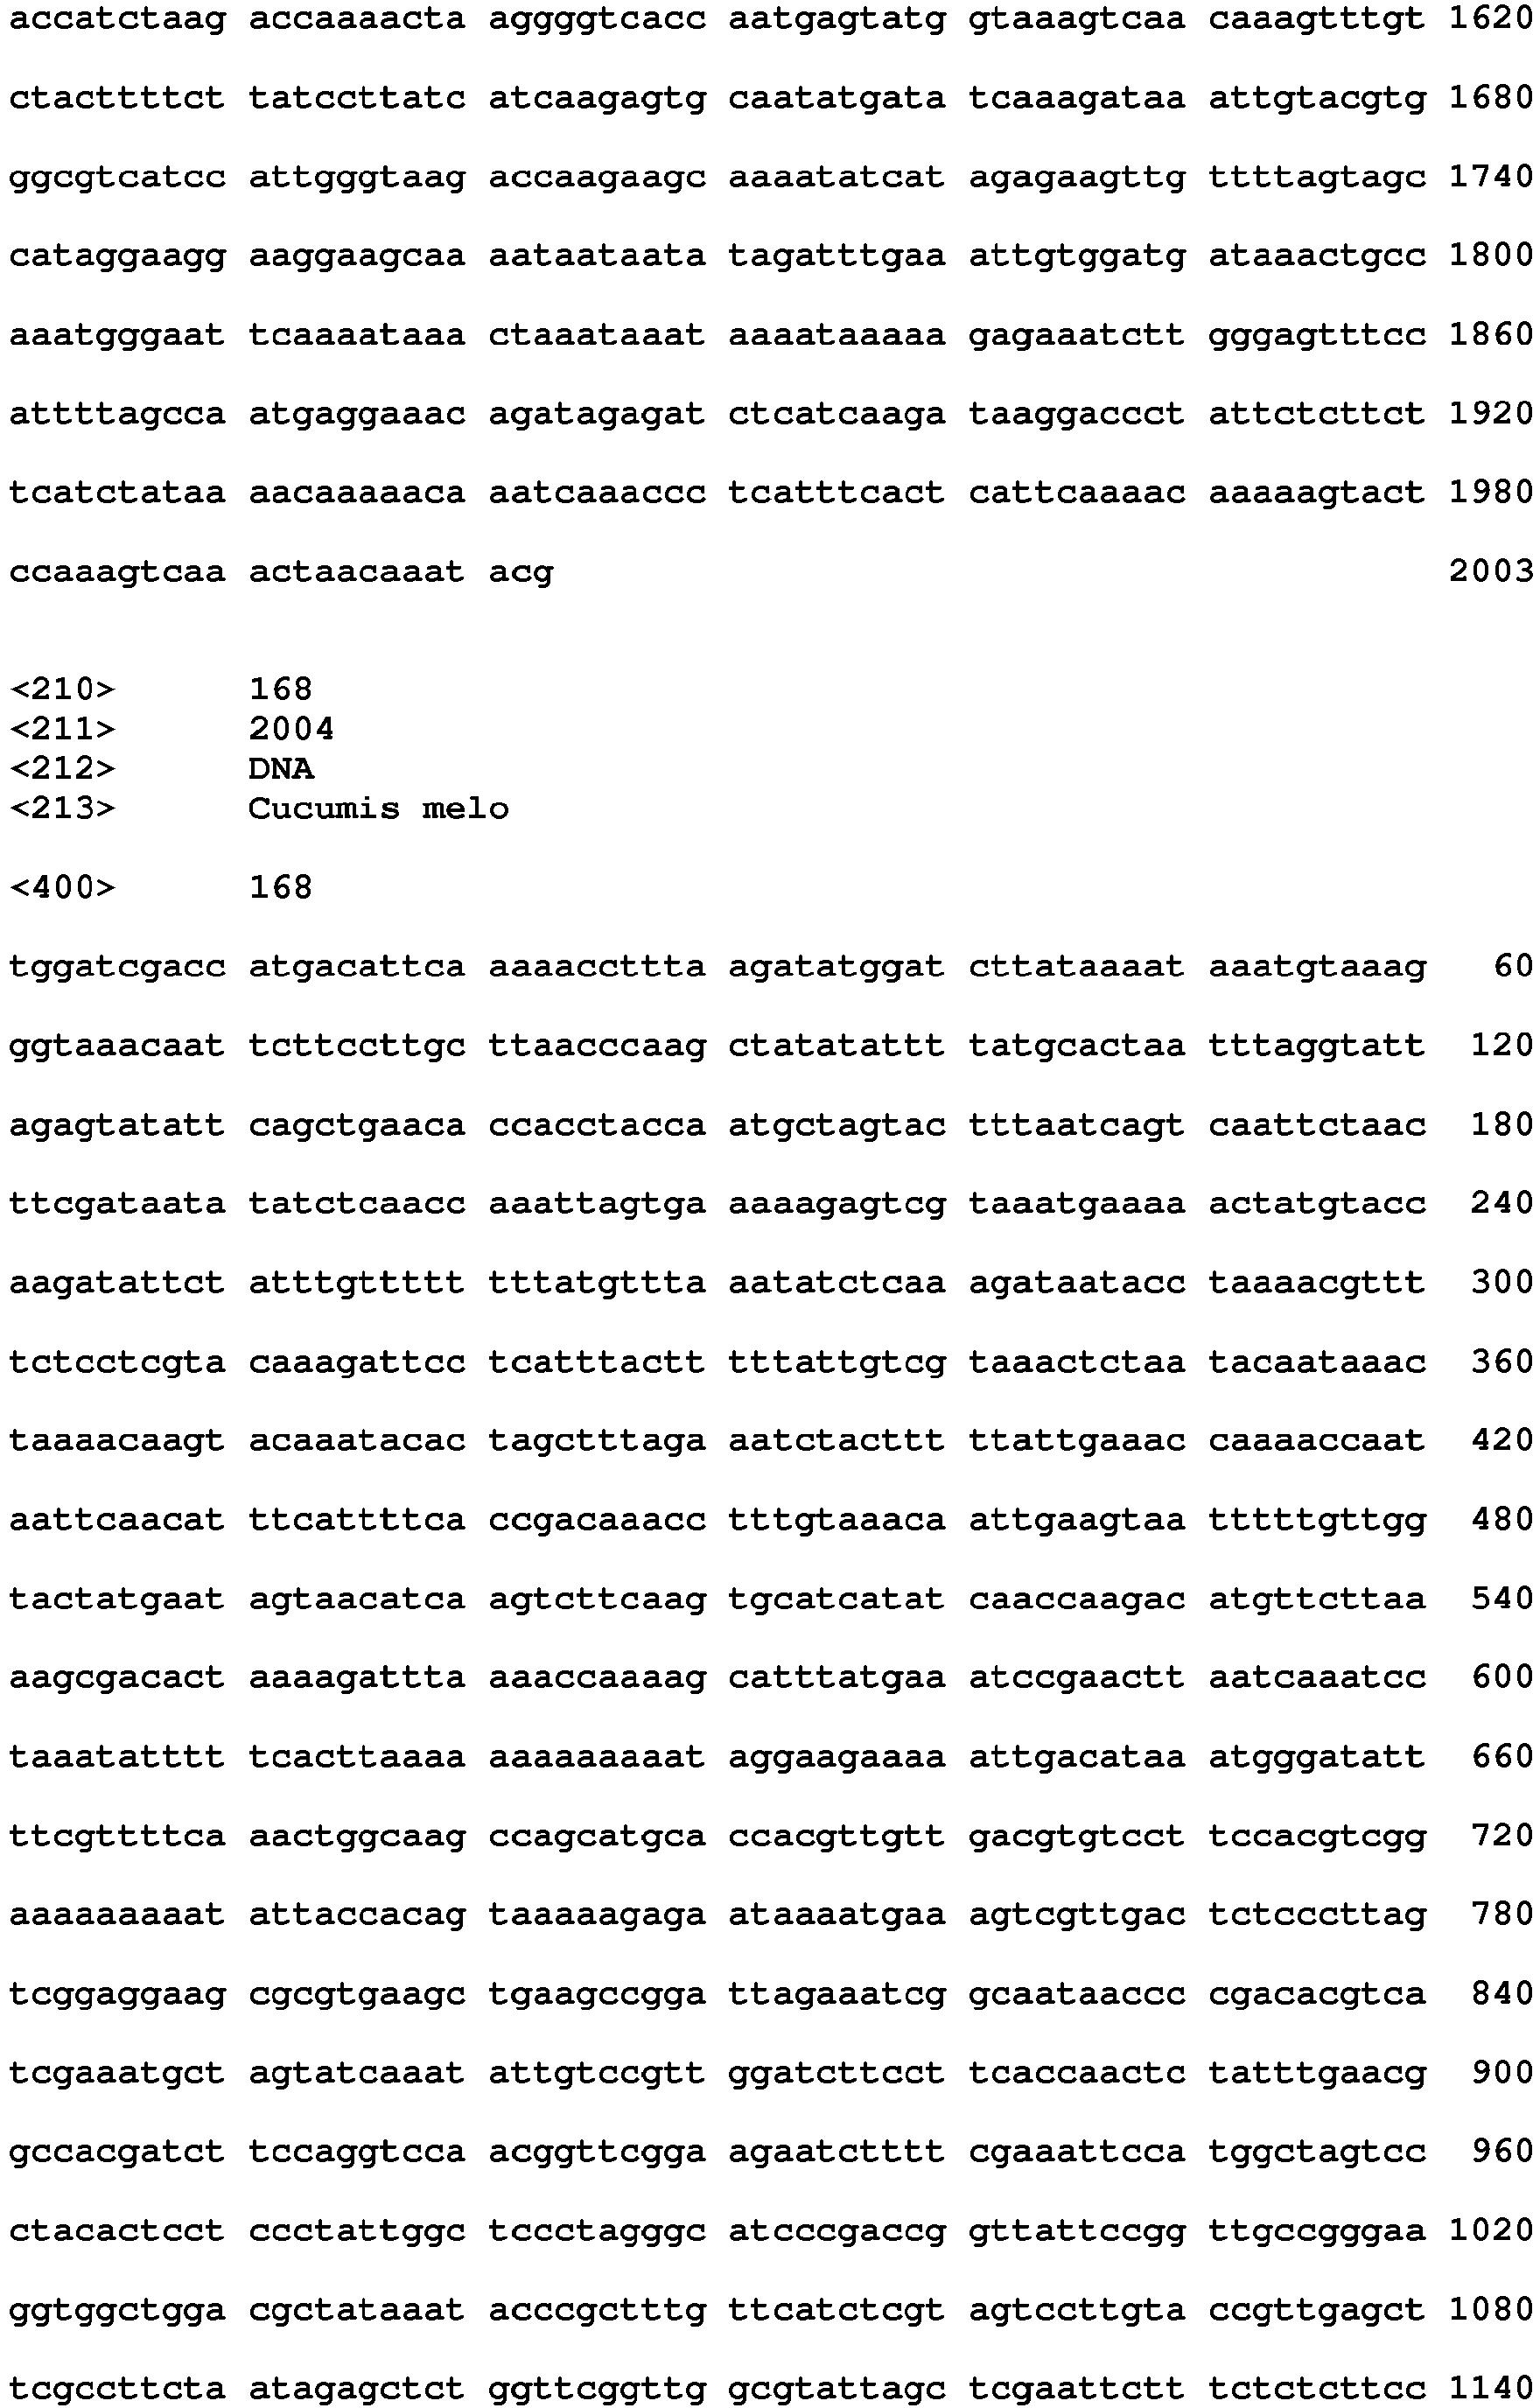 Figure imgb0199